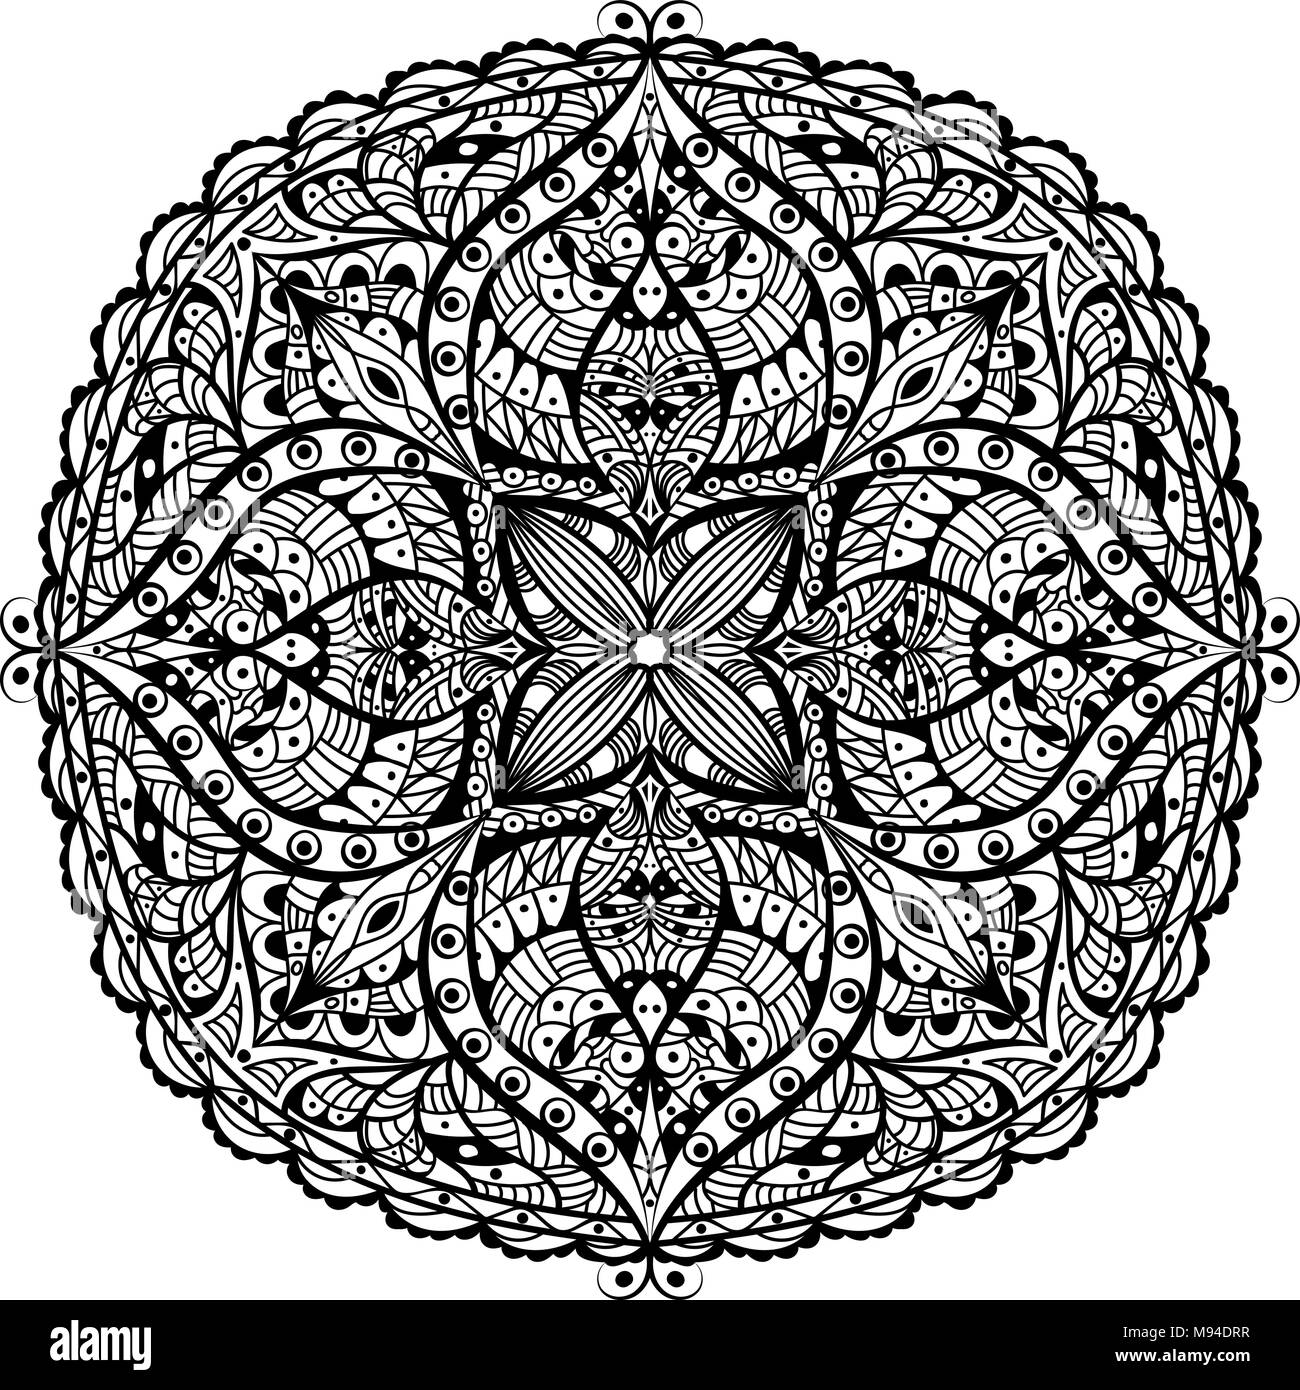 Mandala. Oriental decorative flower pattern - Stock Image